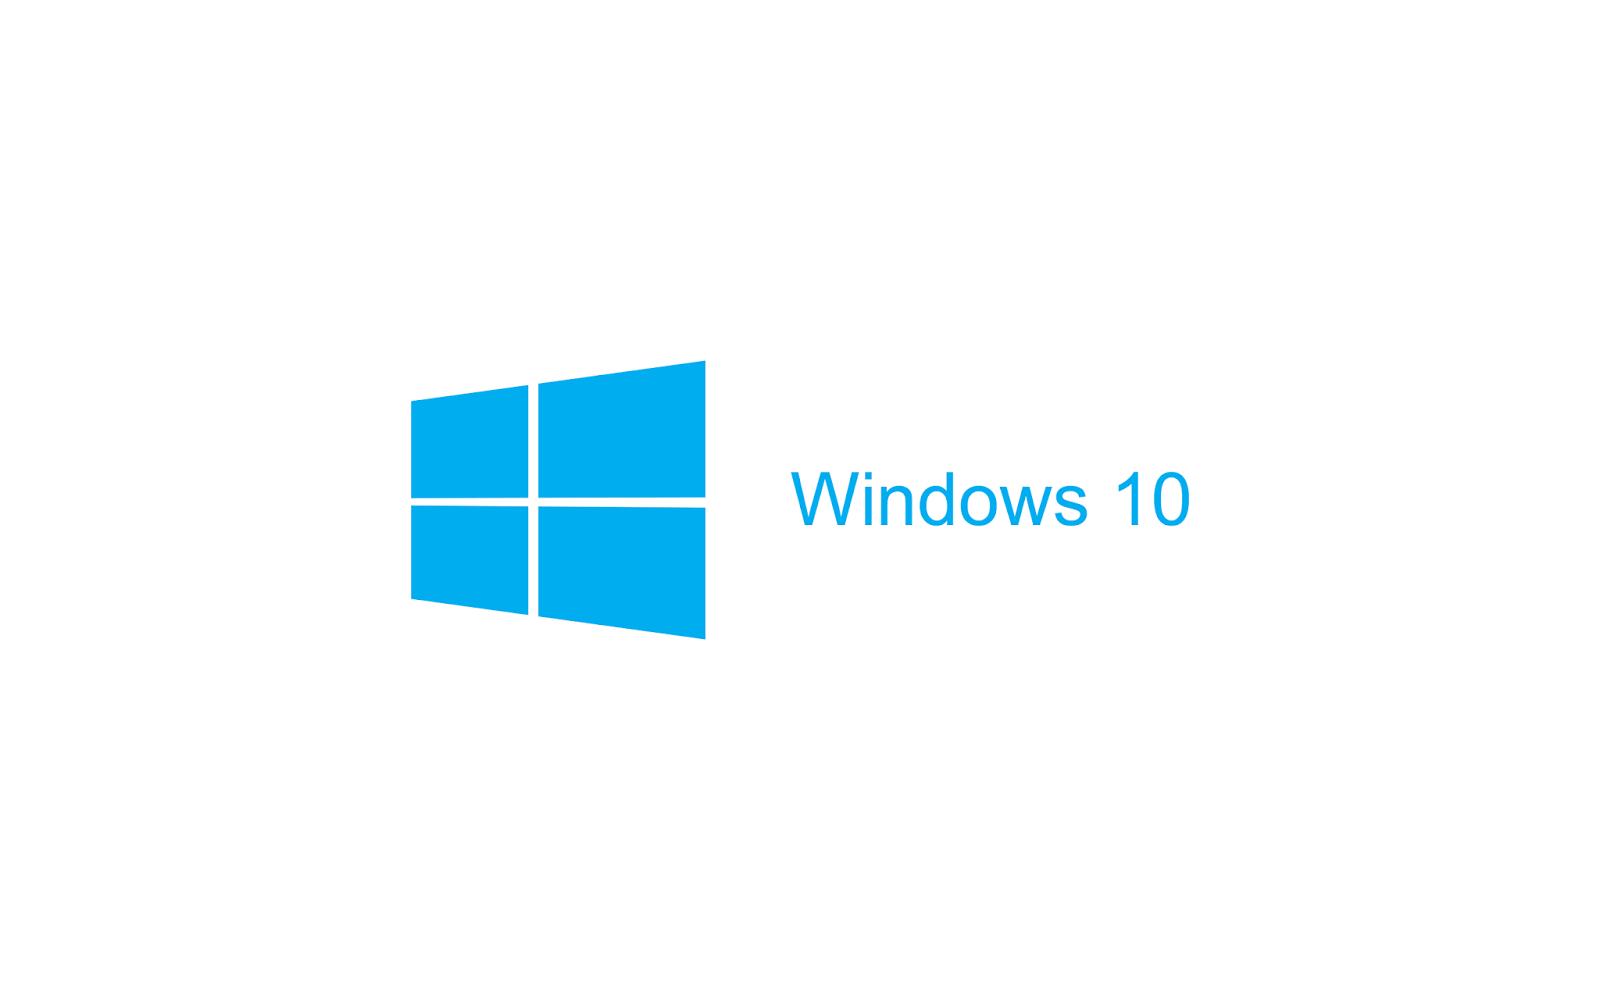 windows 10 wallpaper download,logo,turquoise,text,azure,font